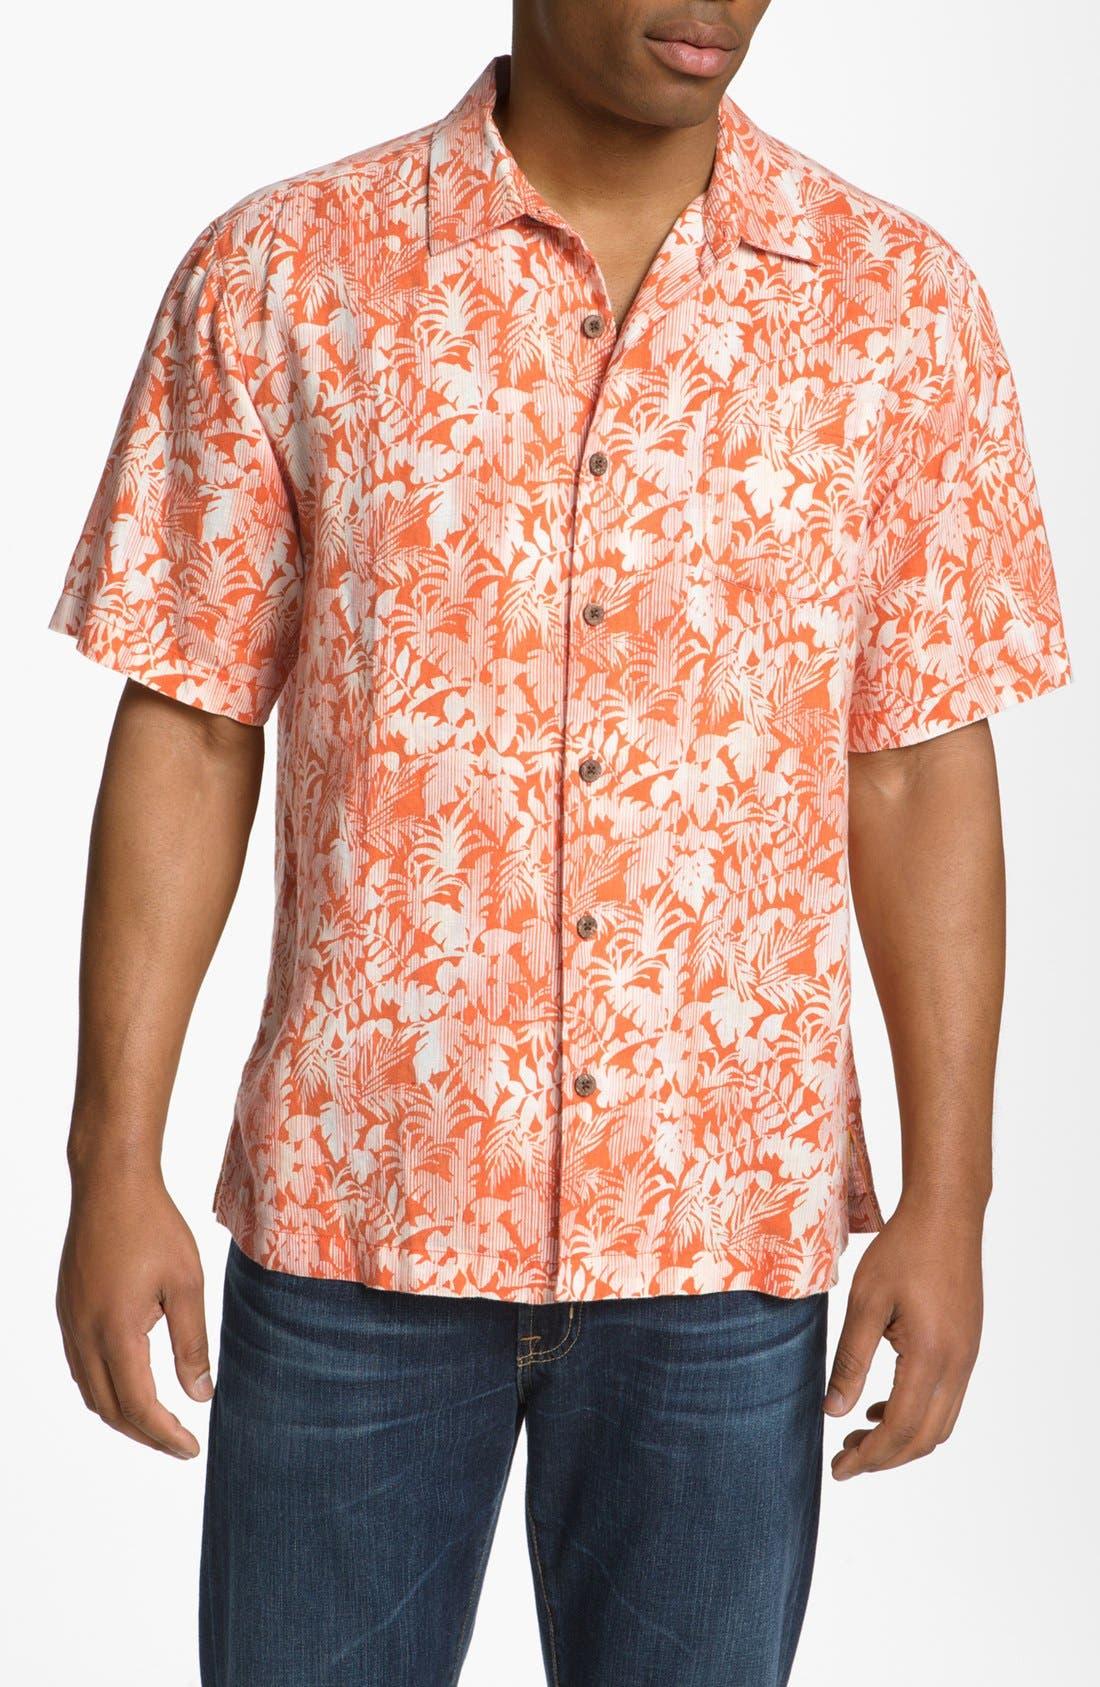 Main Image - Tommy Bahama 'Palma Sola' Campshirt